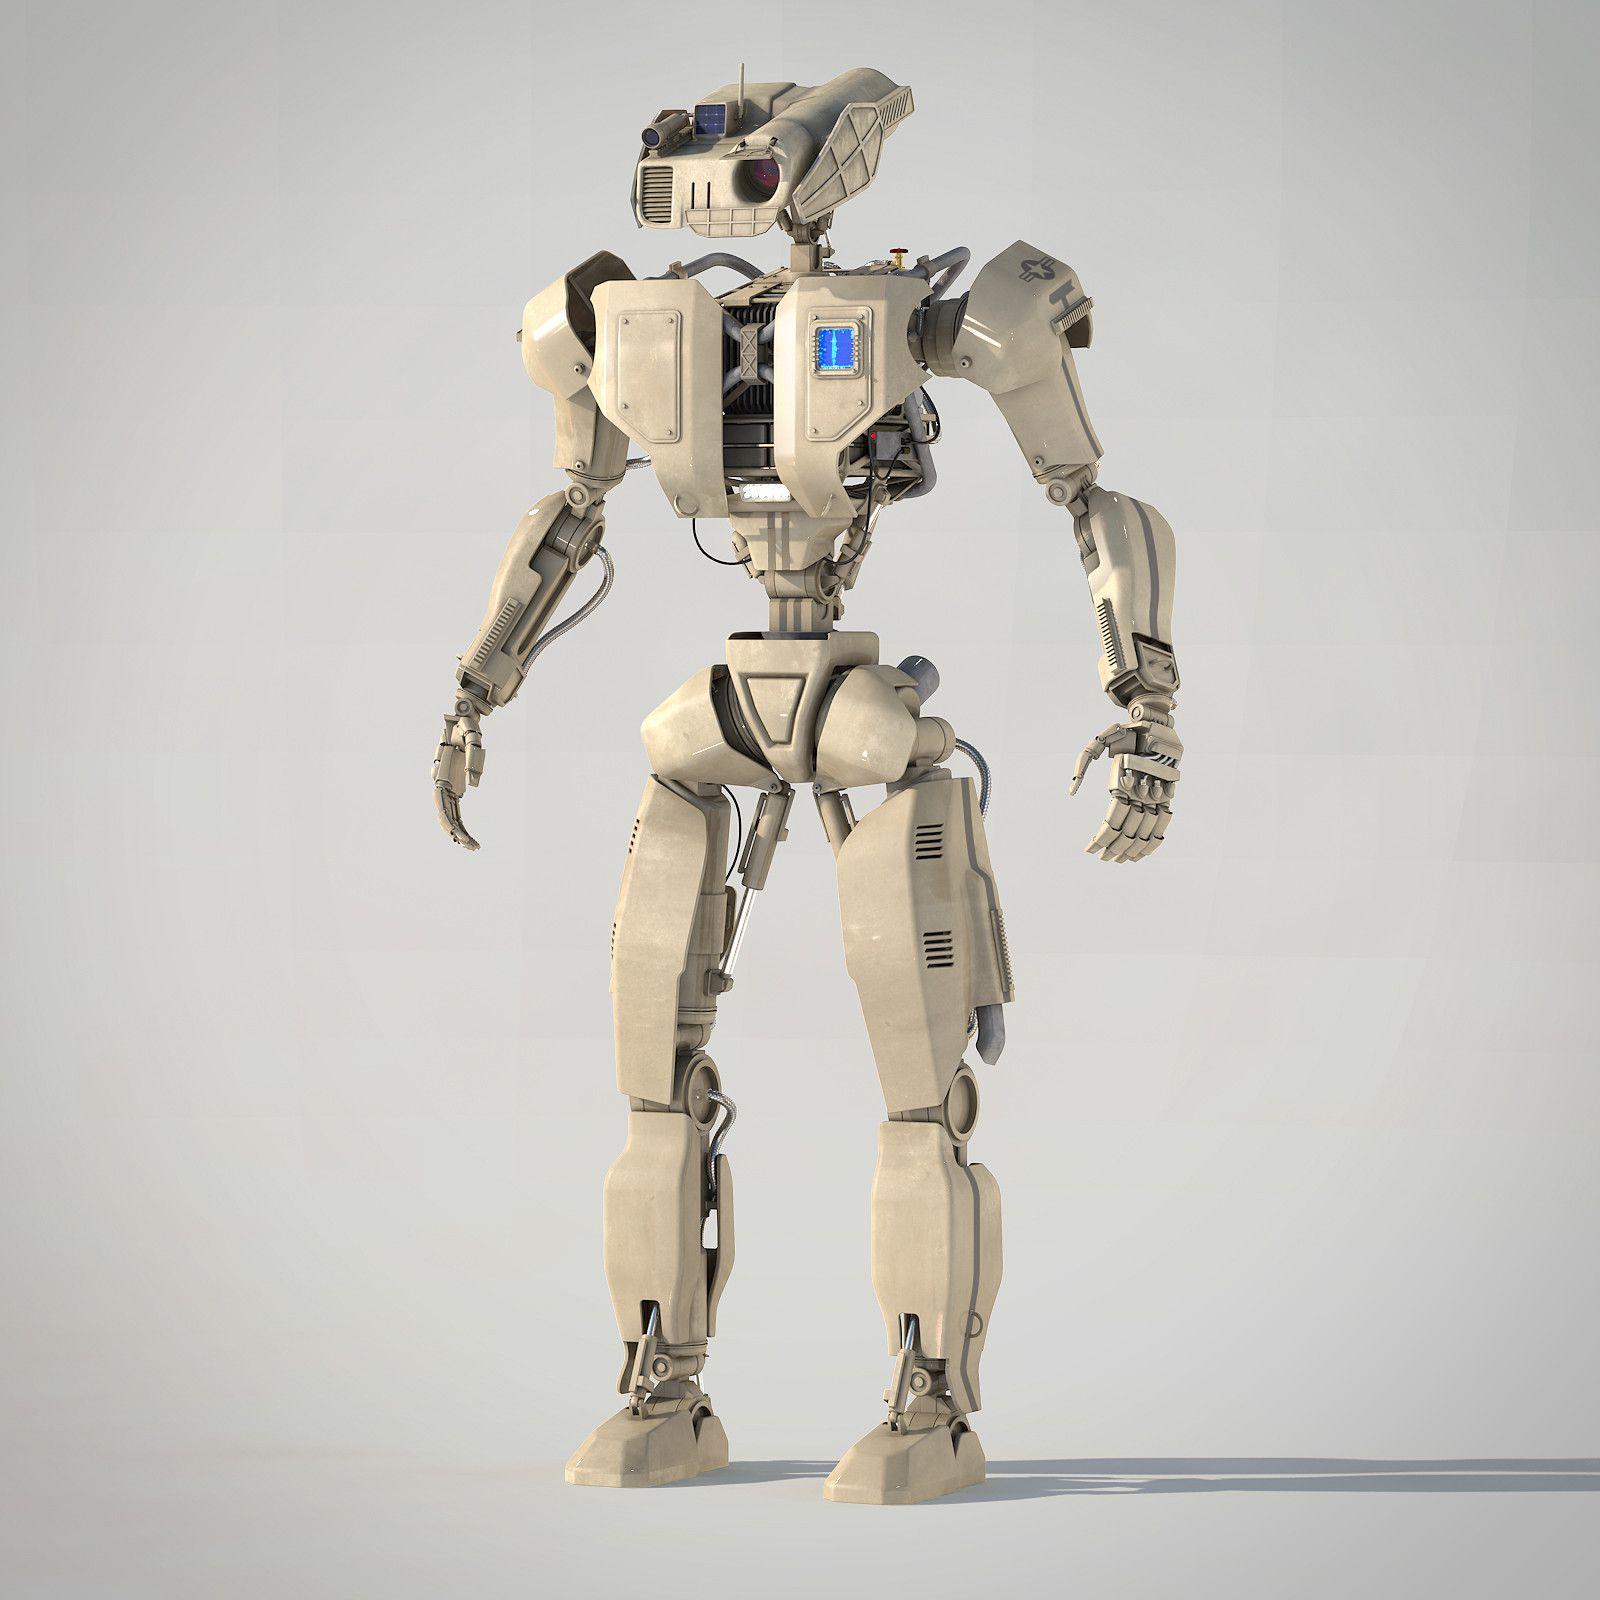 robot android 3d 3ds Robots characters, Robot, 3d model